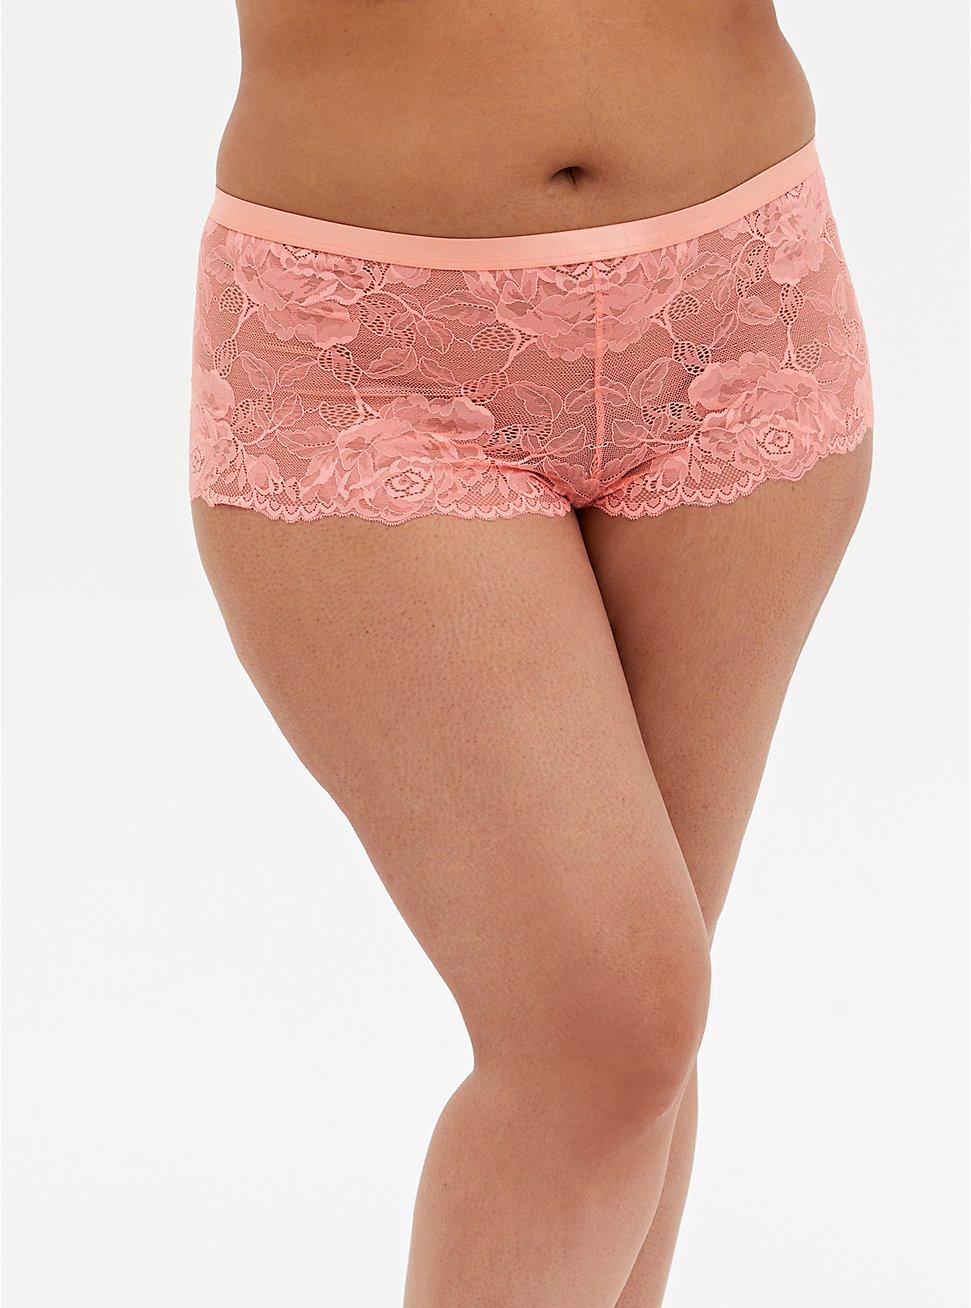 Coral Lace Lattice Back Cheeky Panty, DESERT FLOWER KH, hi-res